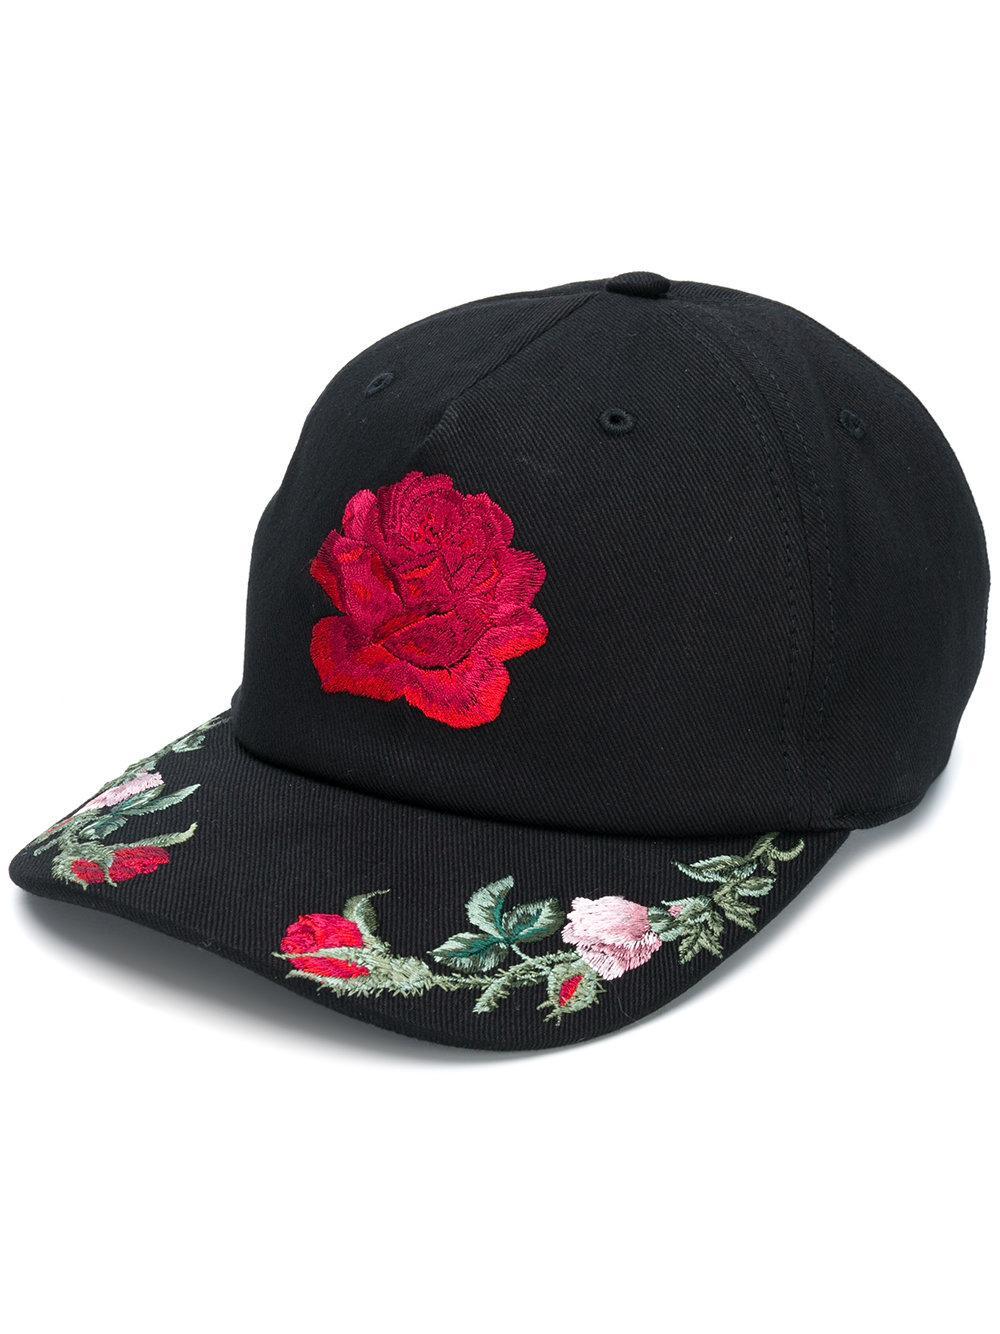 4bc38f52f04 ALEXANDER MCQUEEN. Alexander Mcqueen Floral Embroidered Cap ...